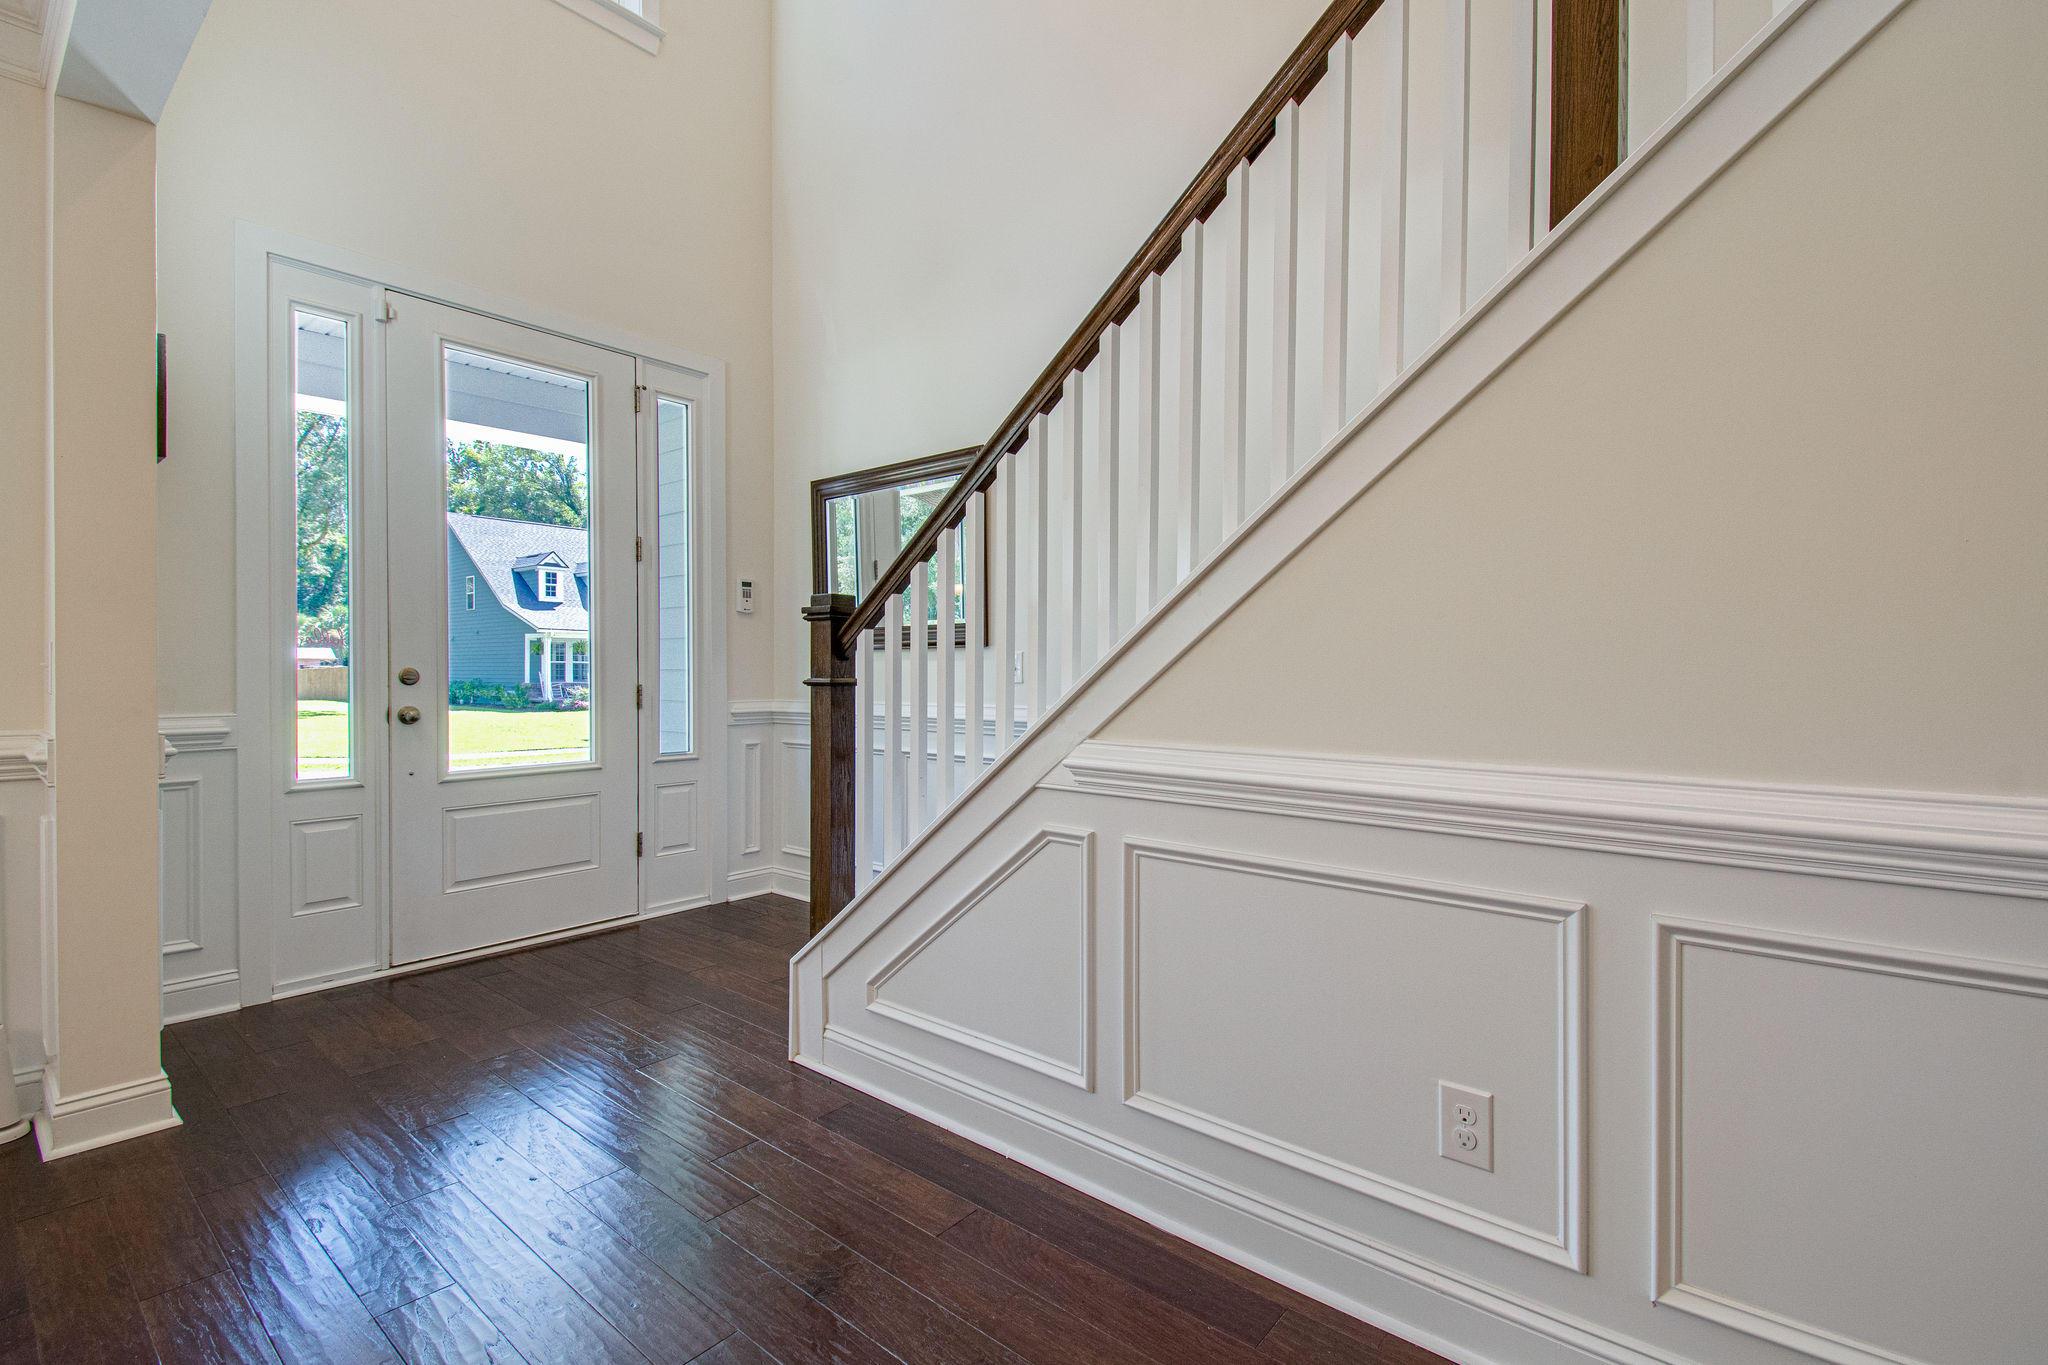 Magnolia Village Homes For Sale - 1261 Pearwood, Mount Pleasant, SC - 2